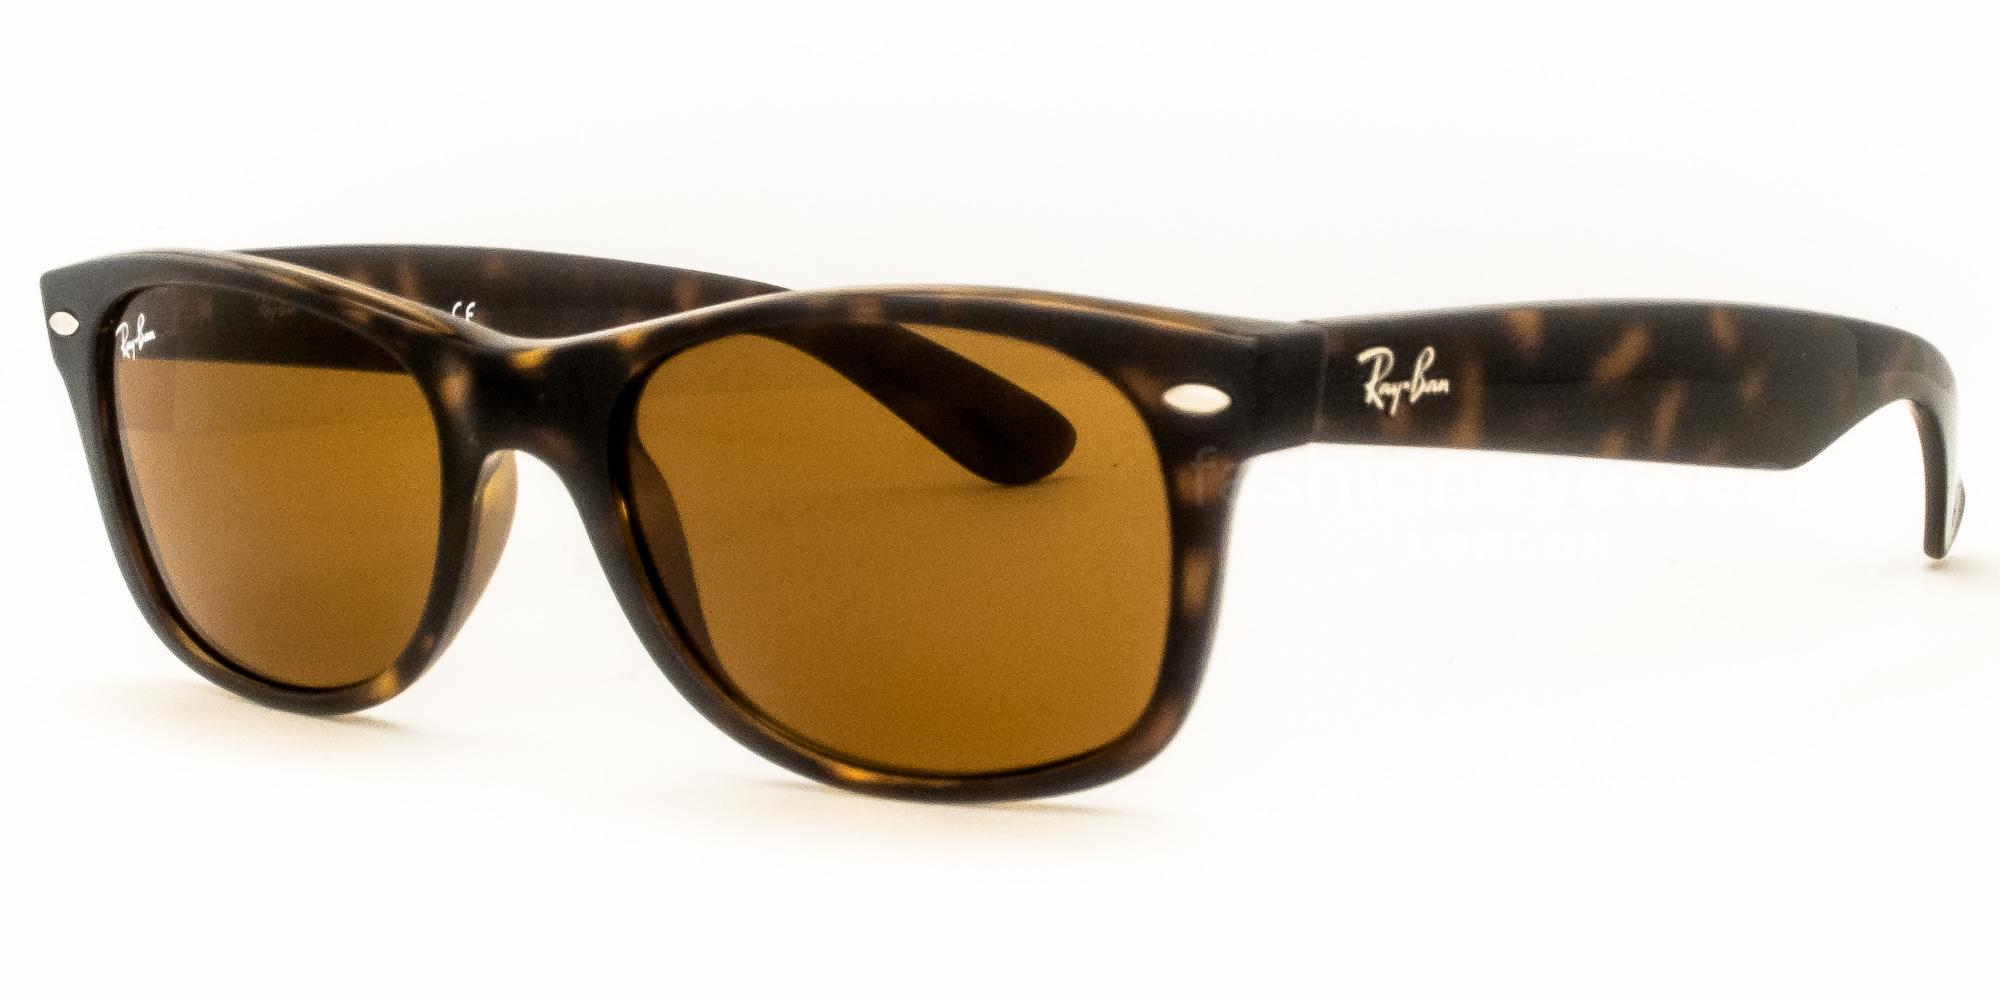 Ray ban sunglasses discount designer sunglasses for Decor my eyes